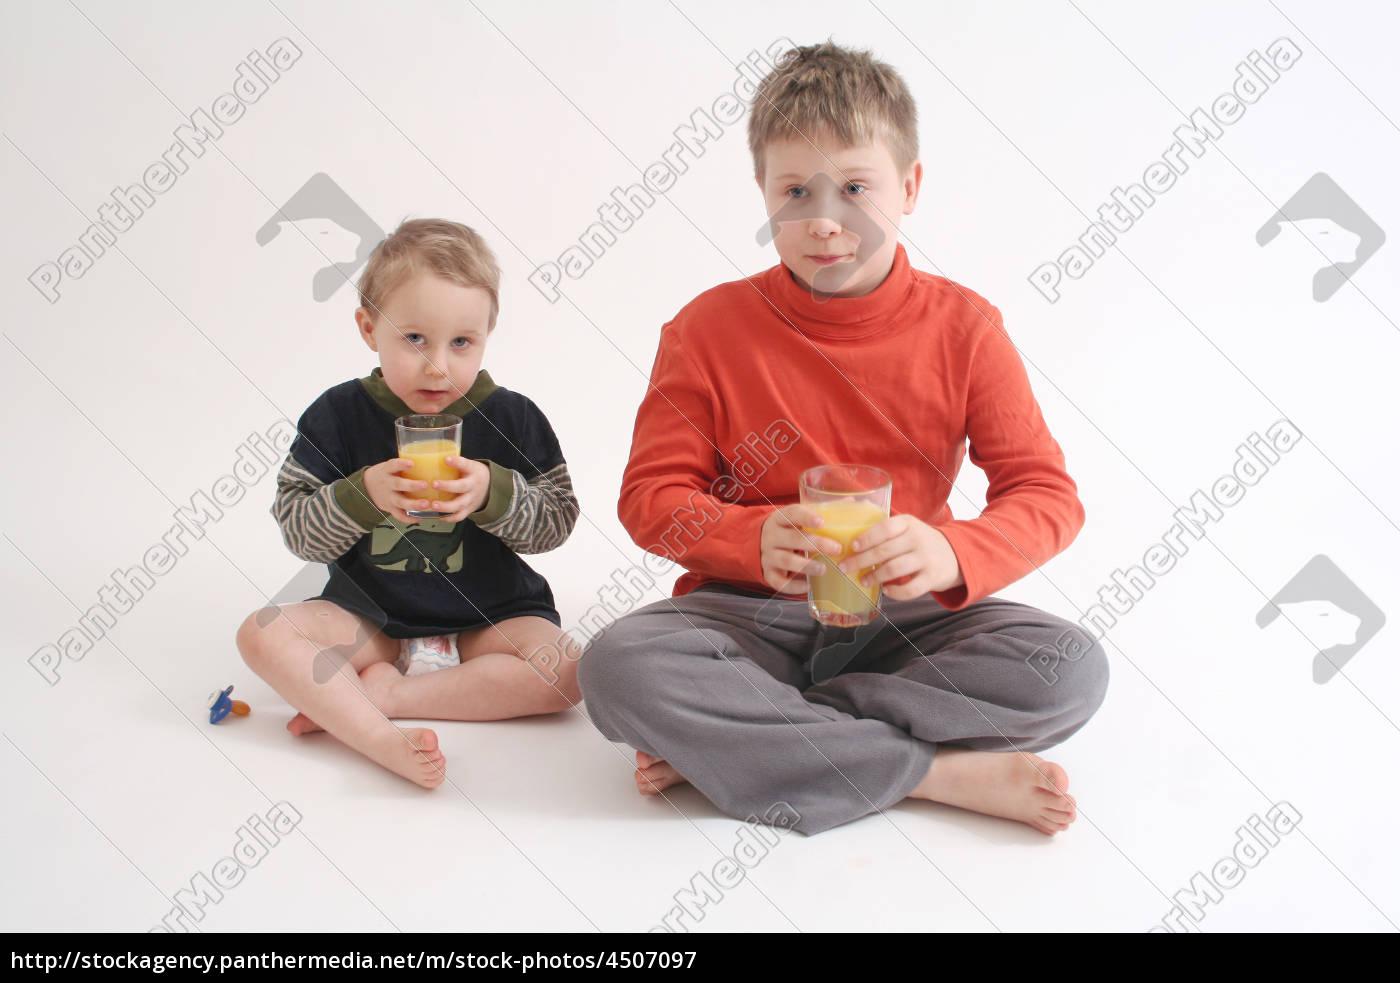 saft, trinken - 4507097